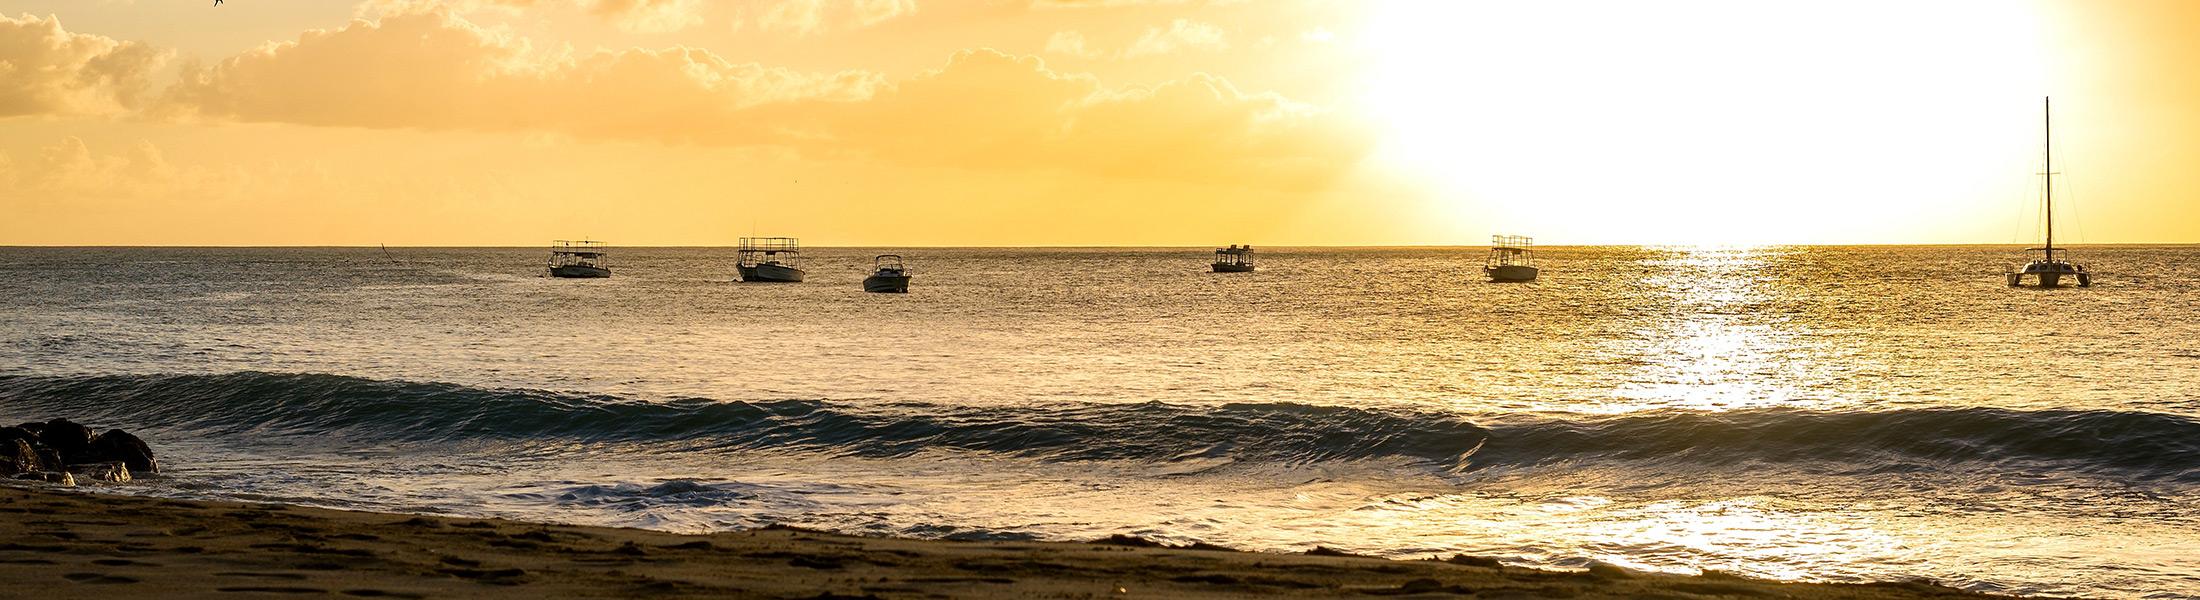 Sunset on the west coast of Barbados at Mango Bay